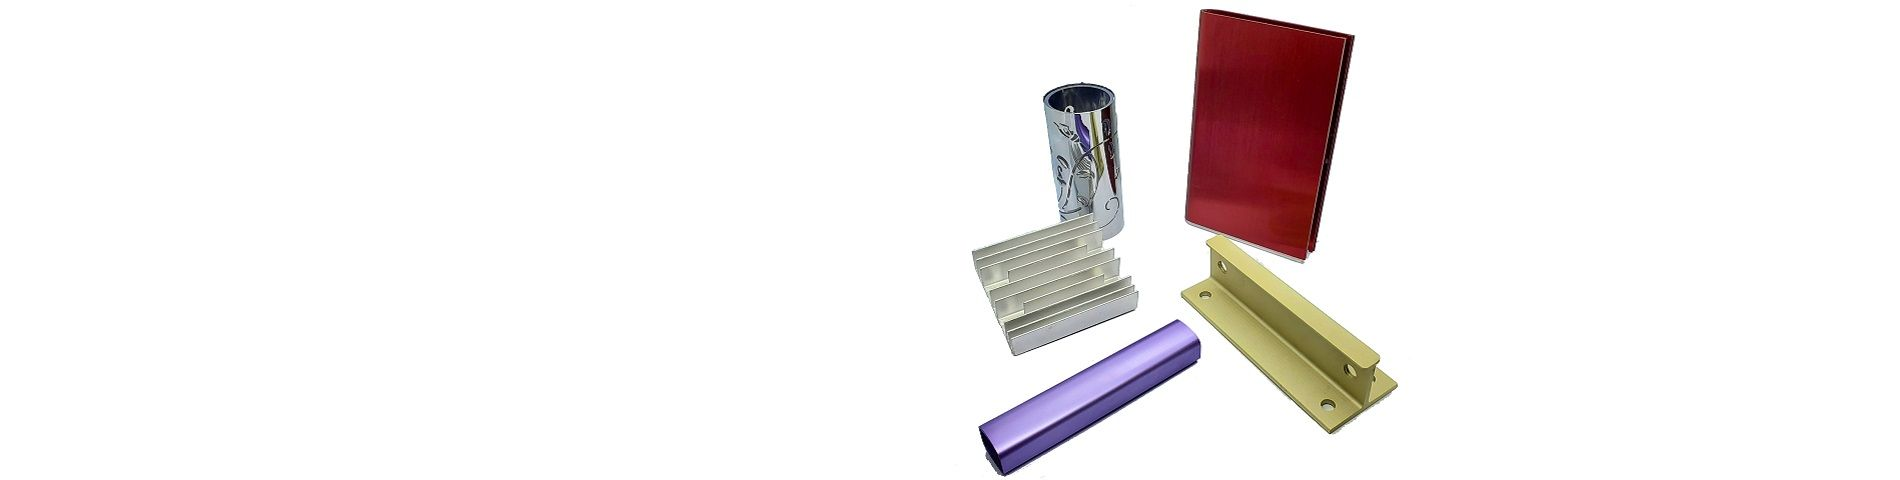 高品質の      金属表面      処理